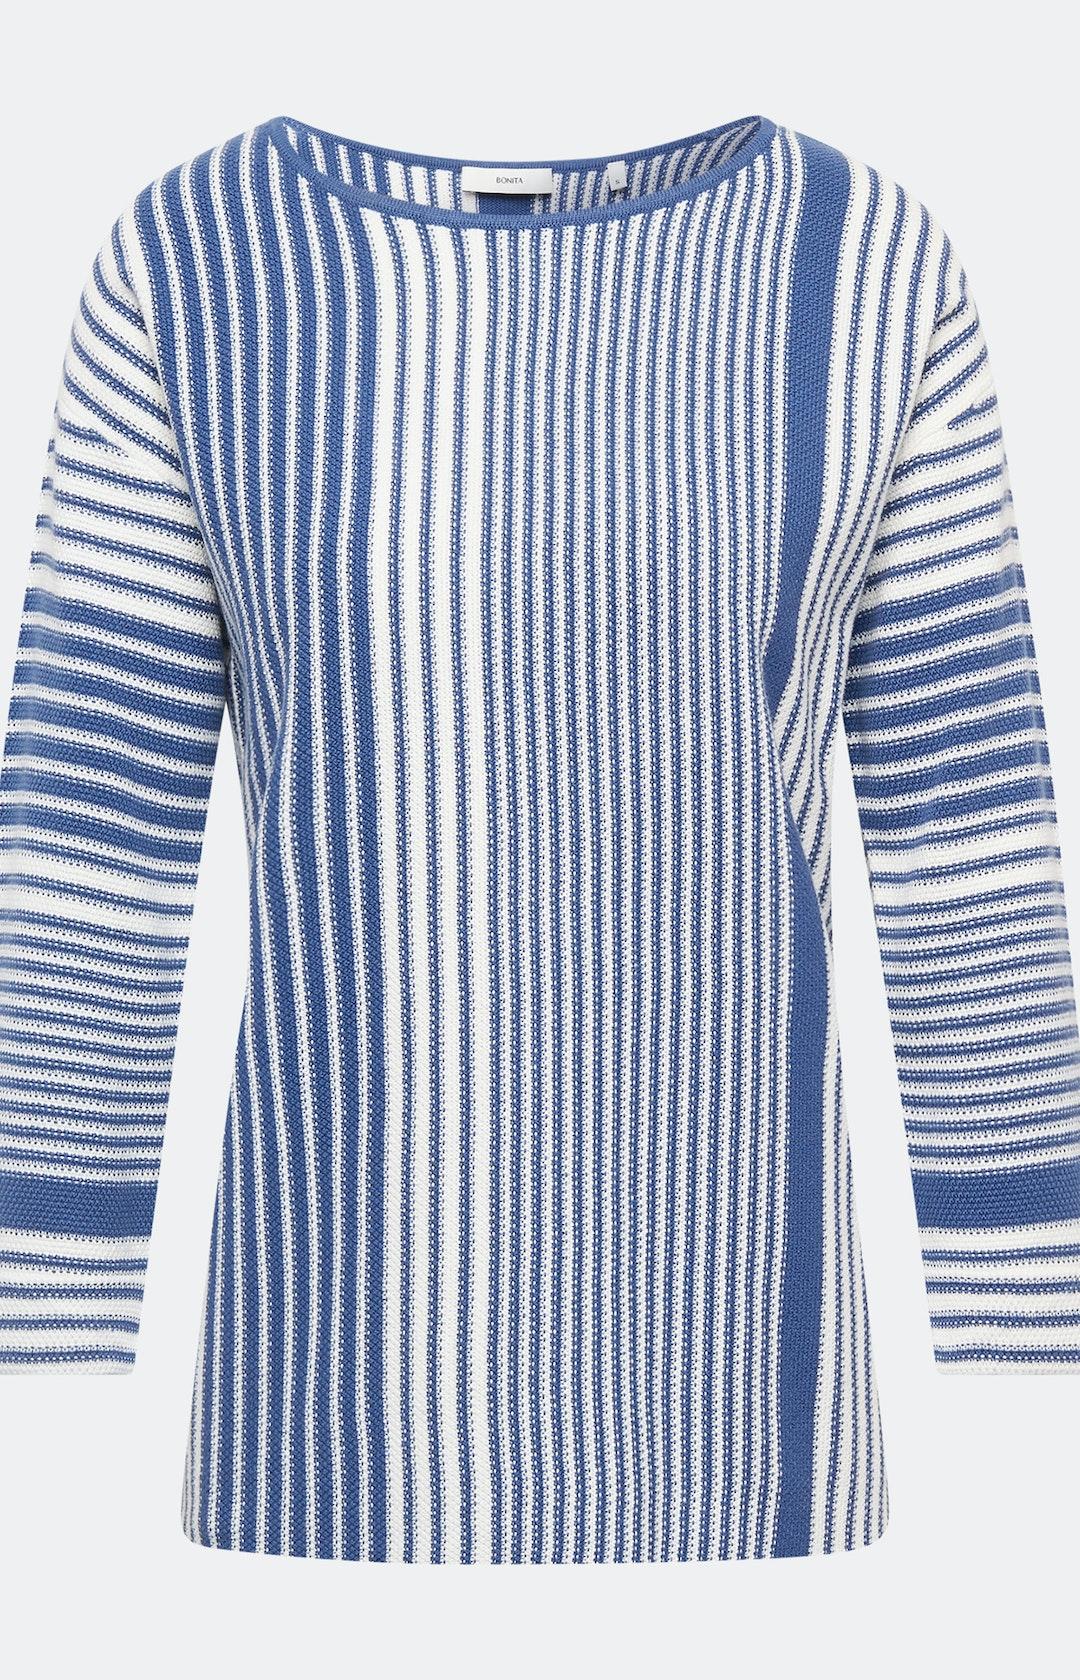 Pullover mit Strickmuster in Blau